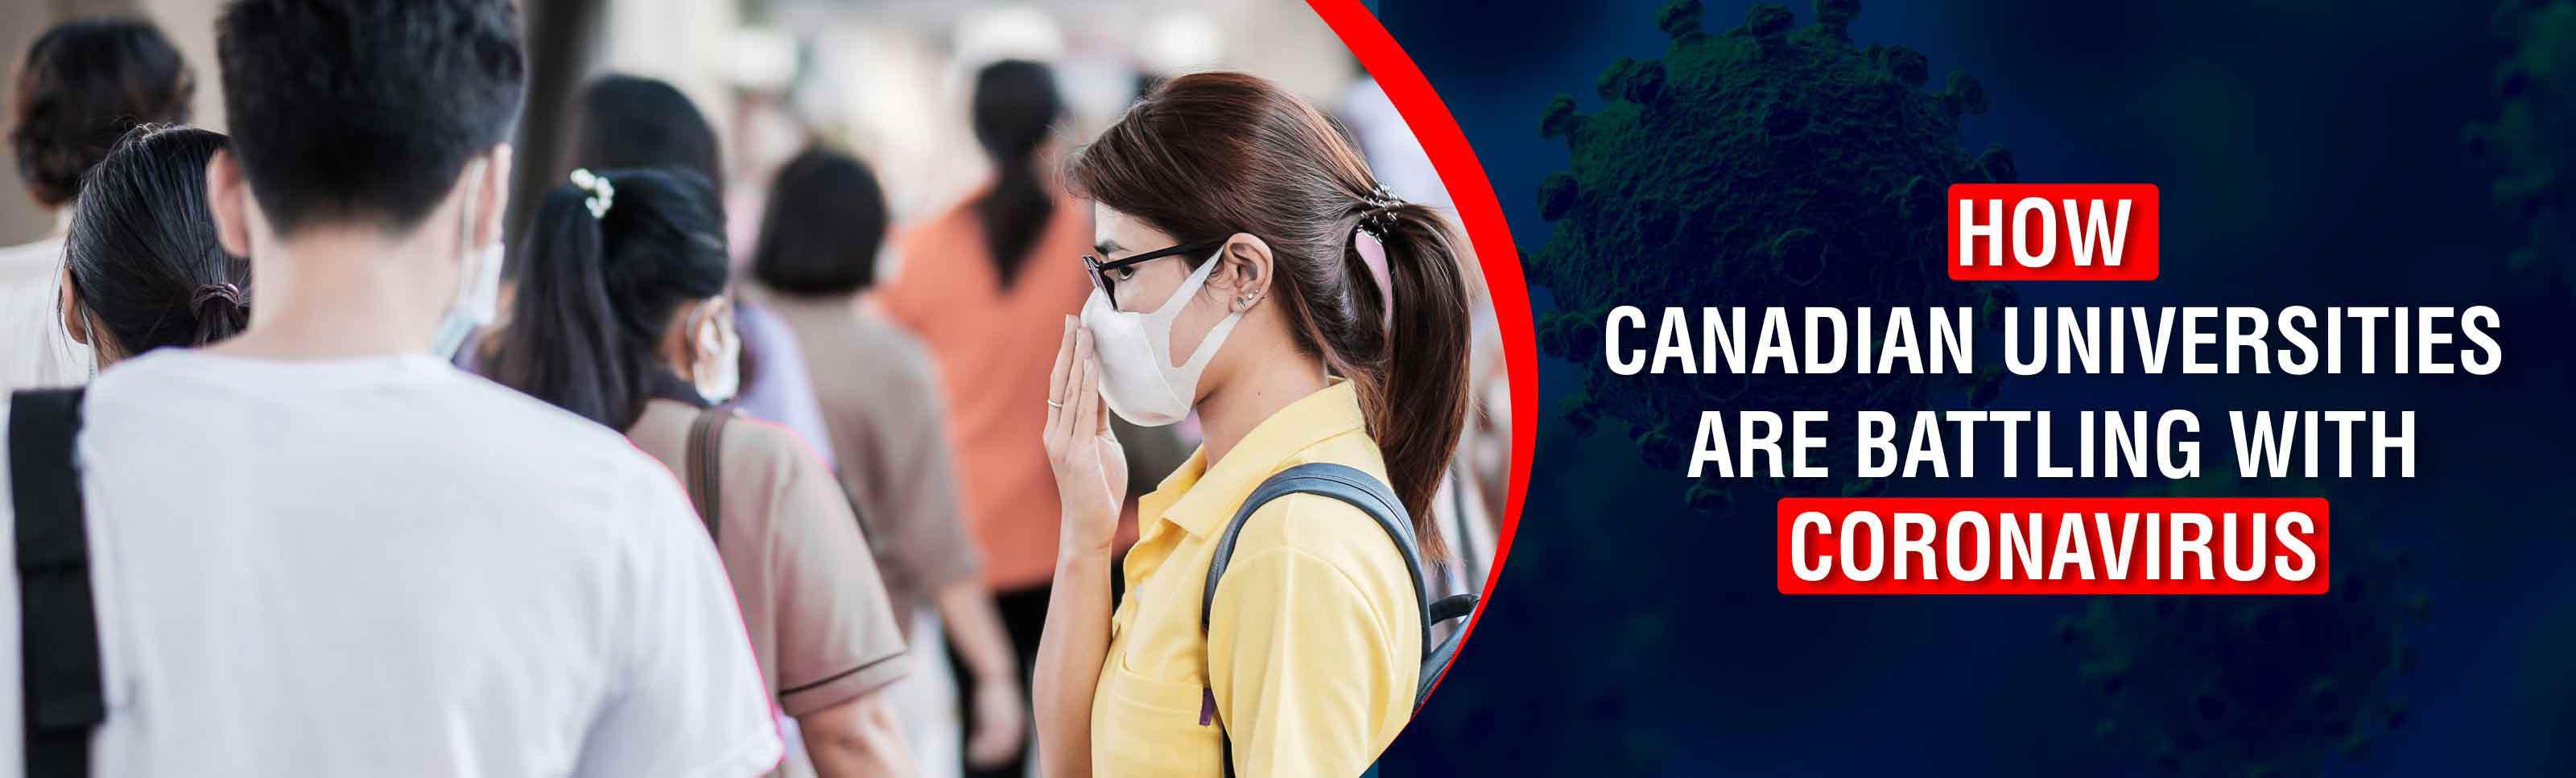 How Canadian universities are battling with coronavirus